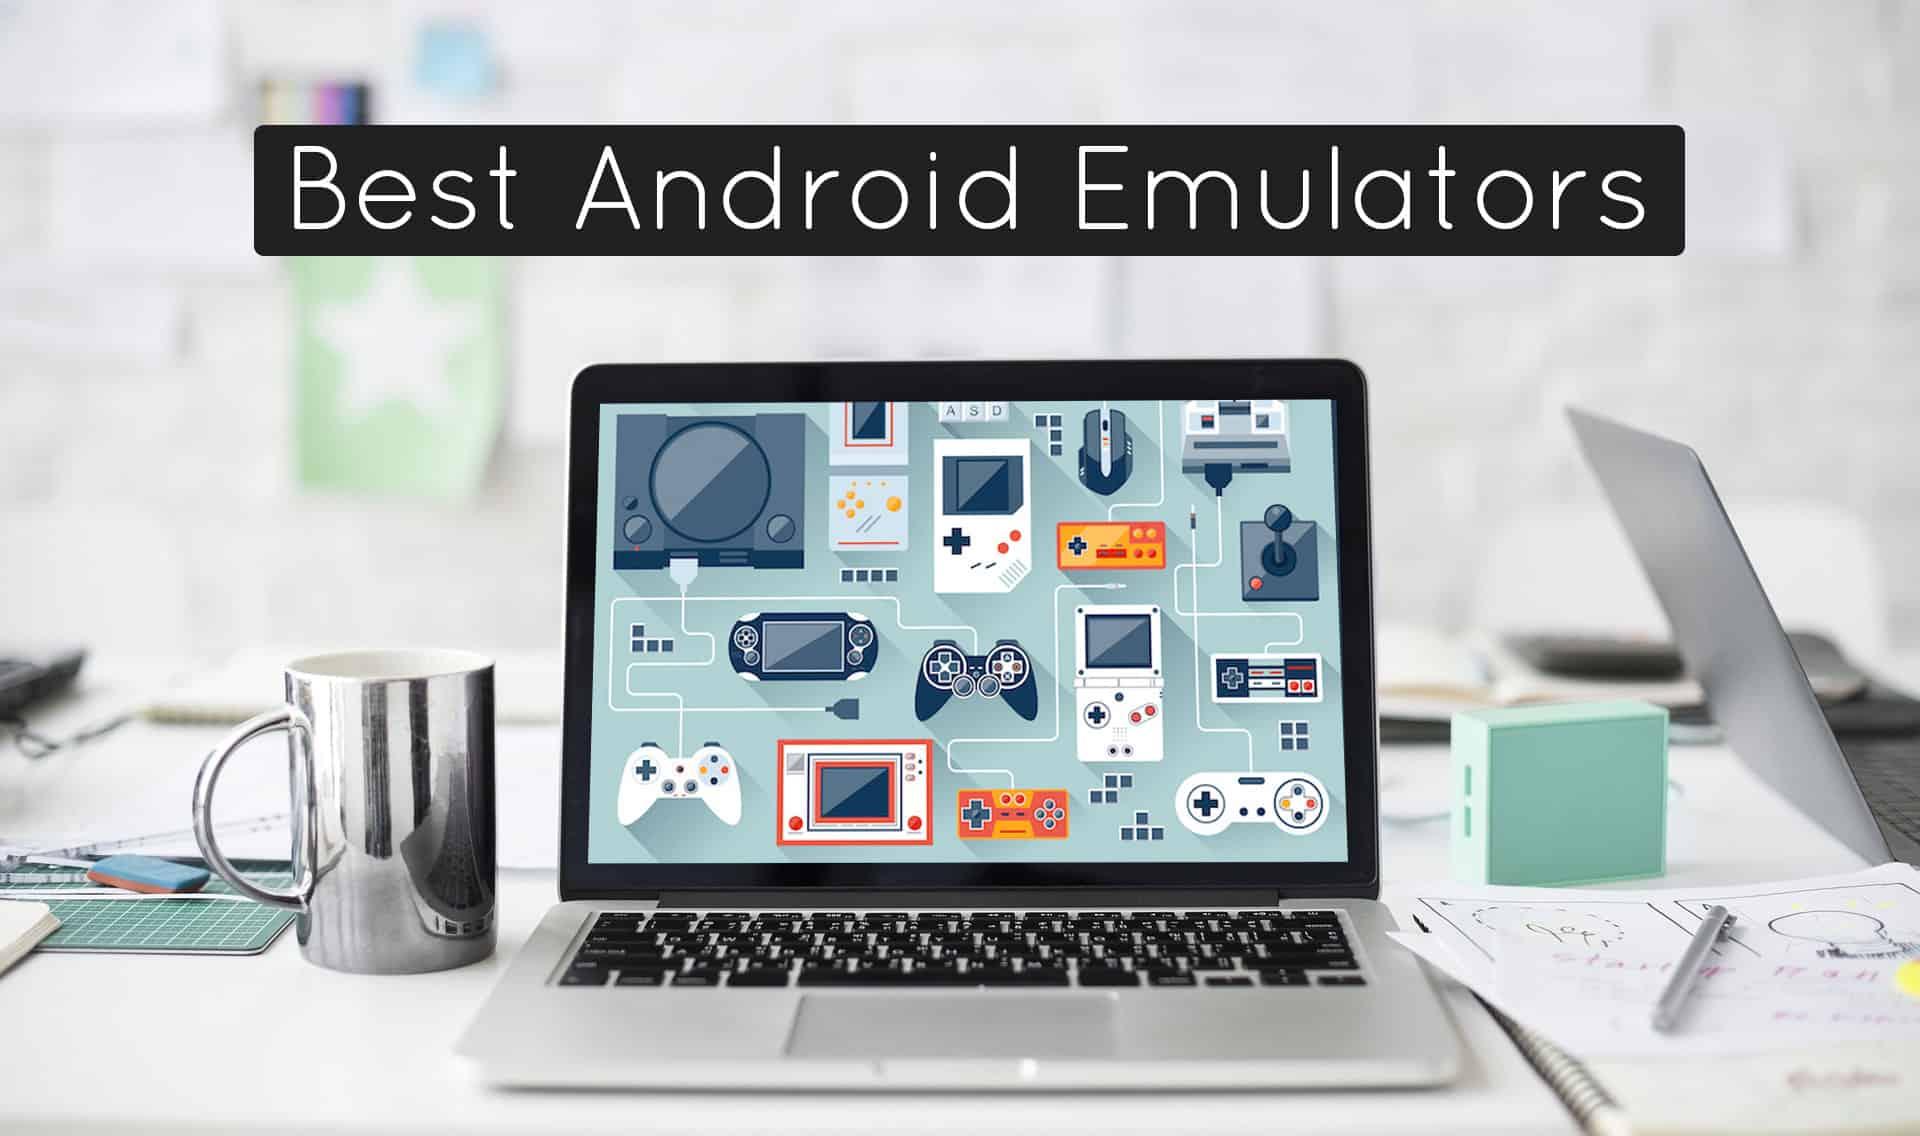 Best Android Emulators for Windows 2018